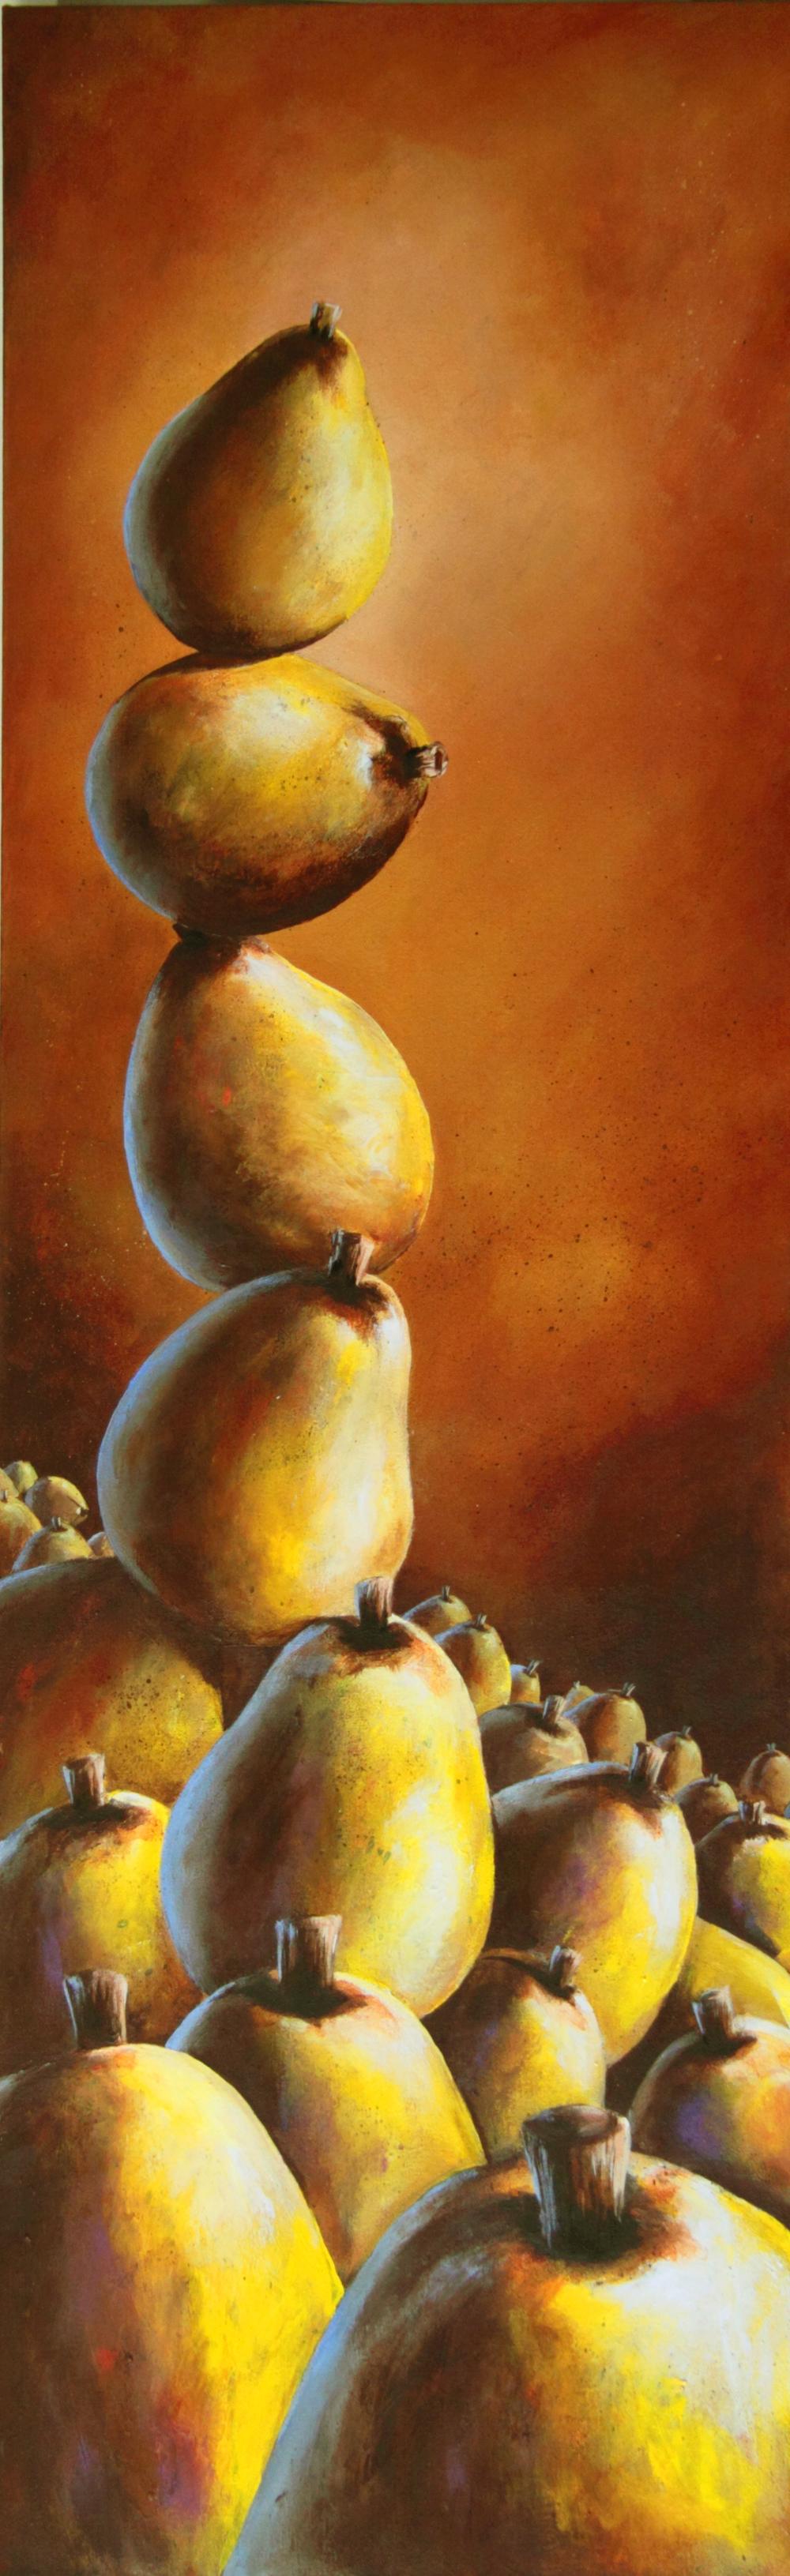 """Balancing Act  "", 50"" x 20 "", Acrylic on canvas"